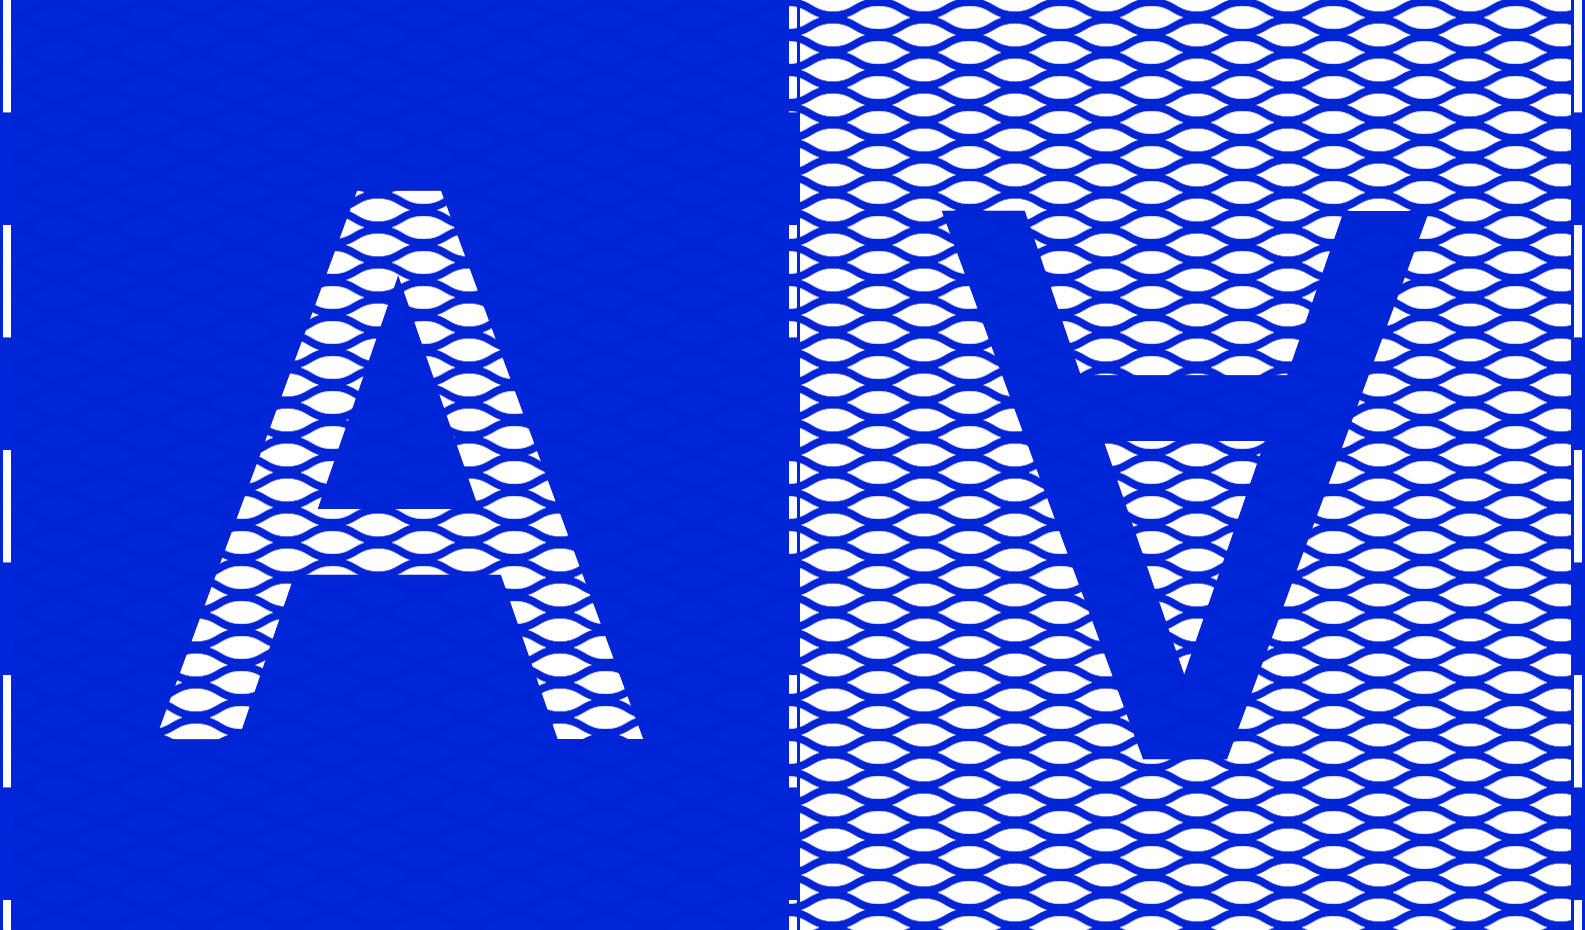 Aalto Graphic Design